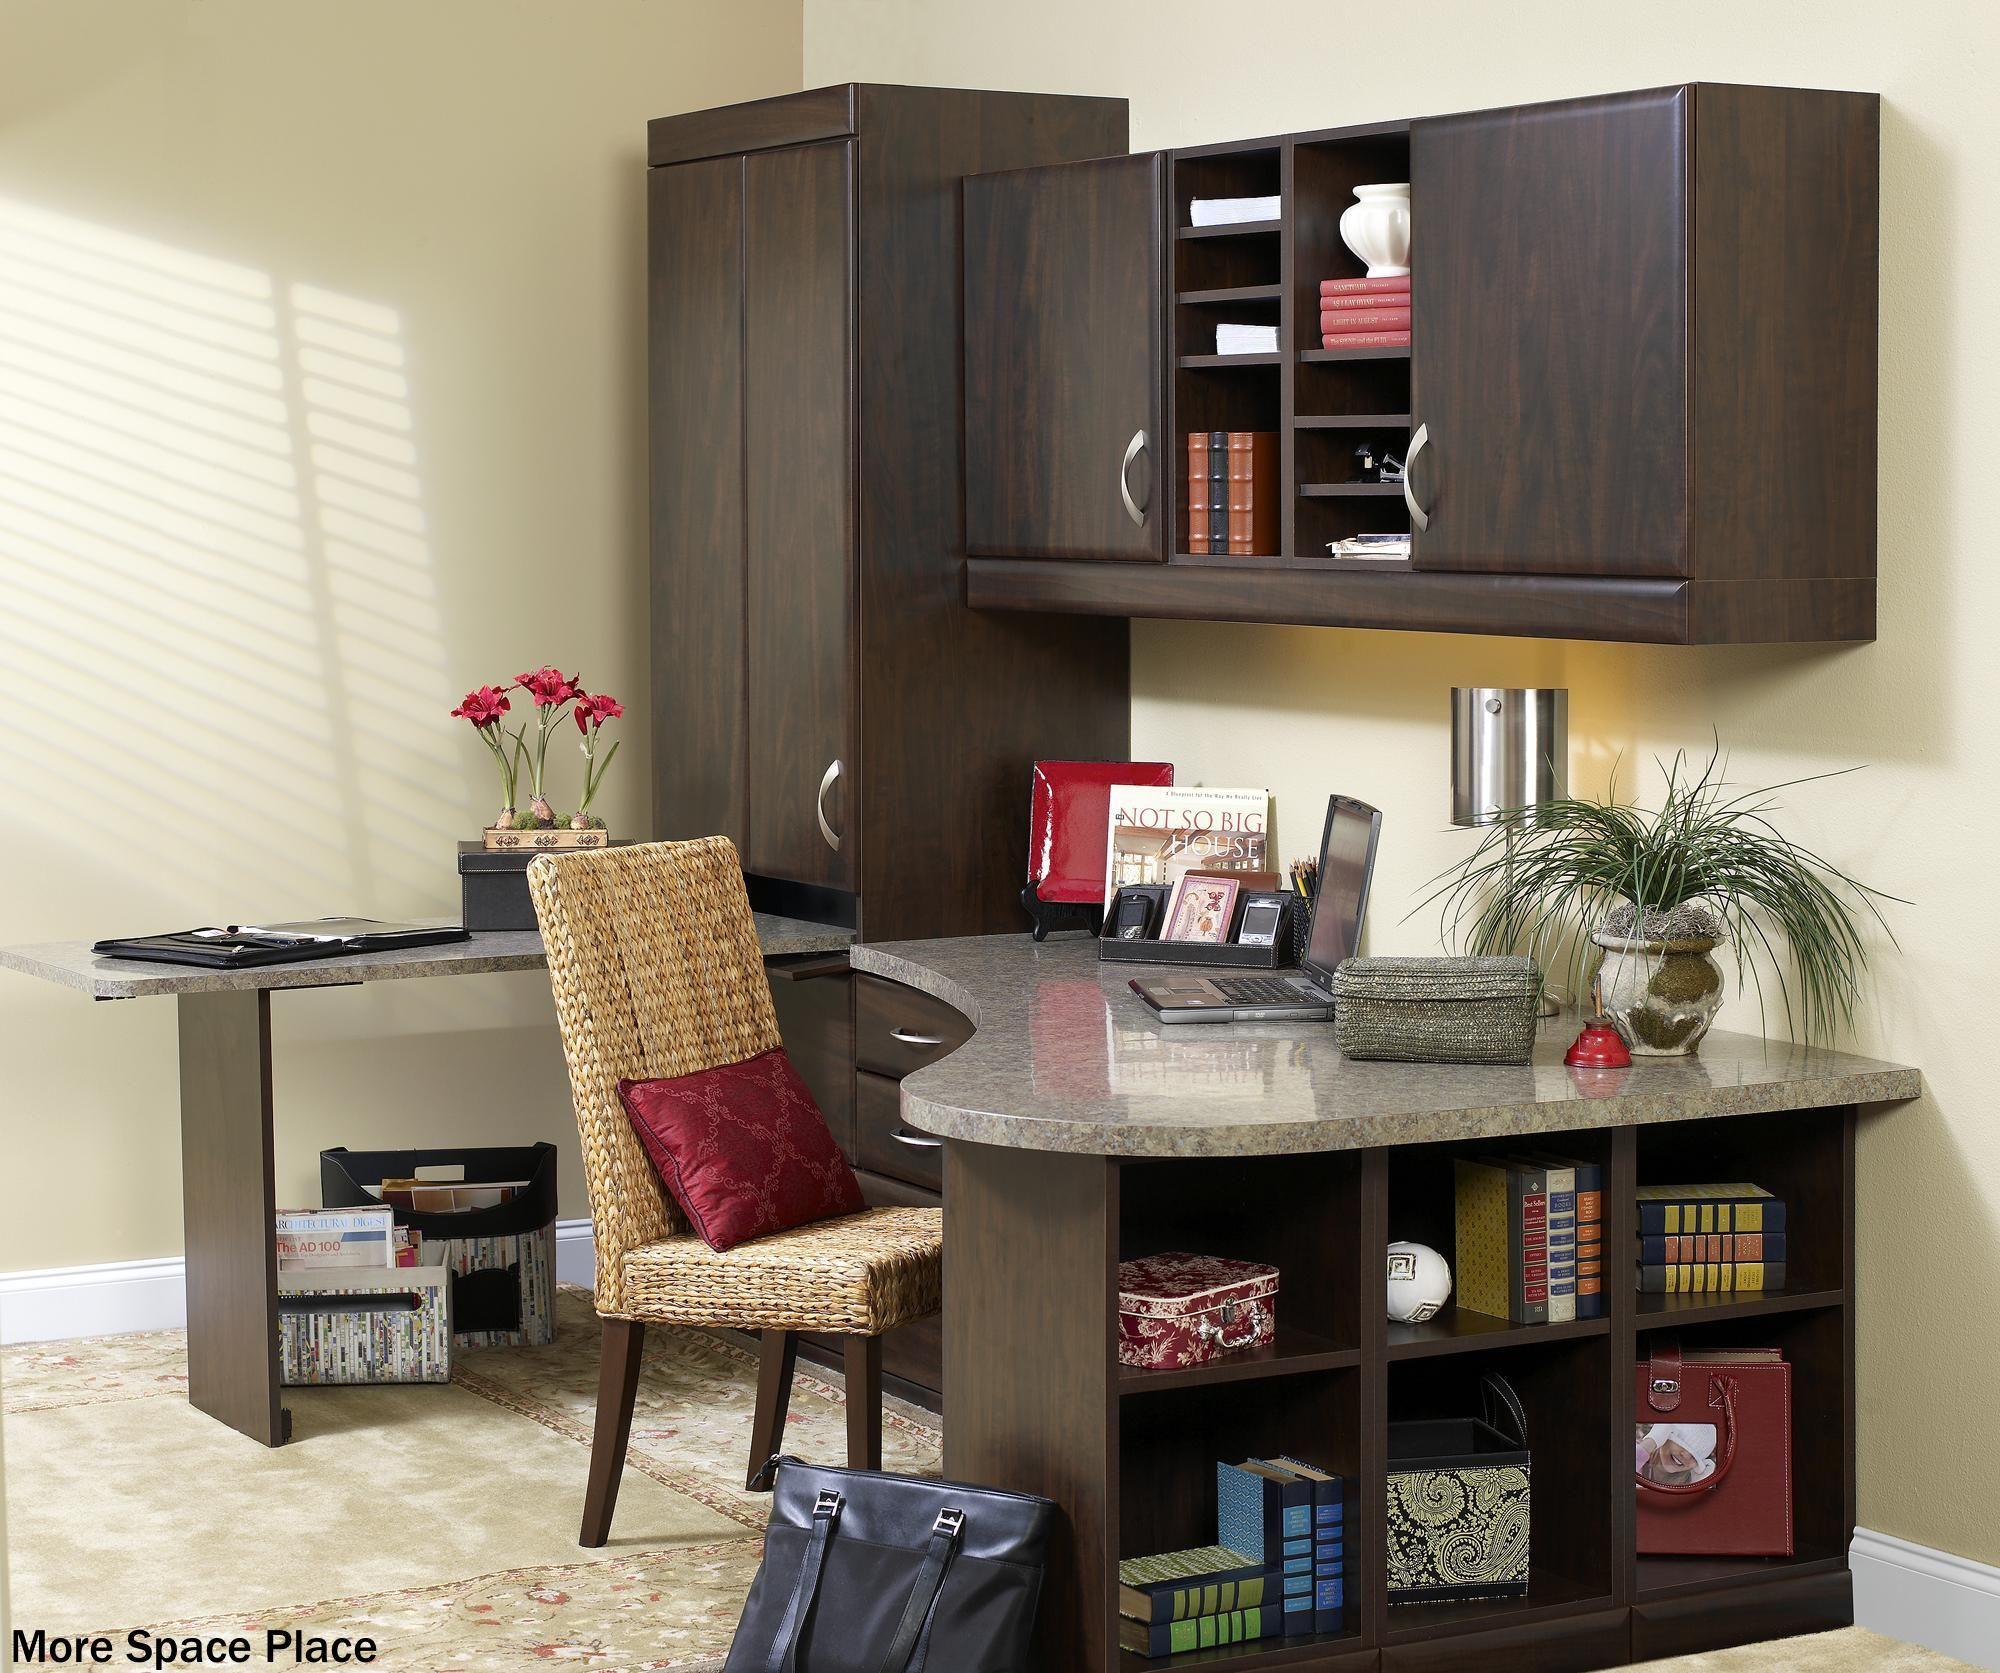 terrific corner home office with plenty of cabinets and open shelves rh ar pinterest com